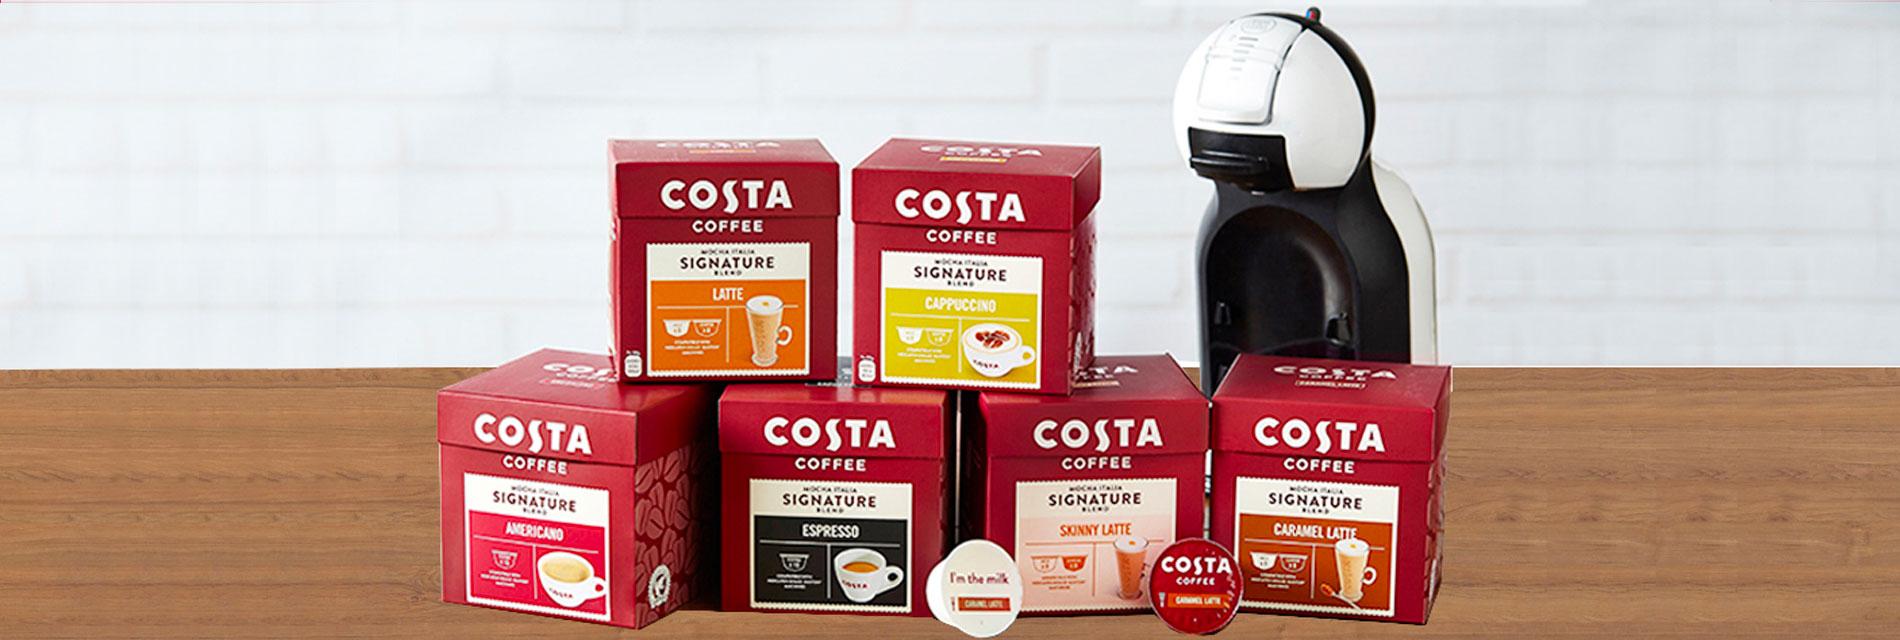 http://www.enaturalltd.com/product-category/drinks/coffee/costa-coffee/